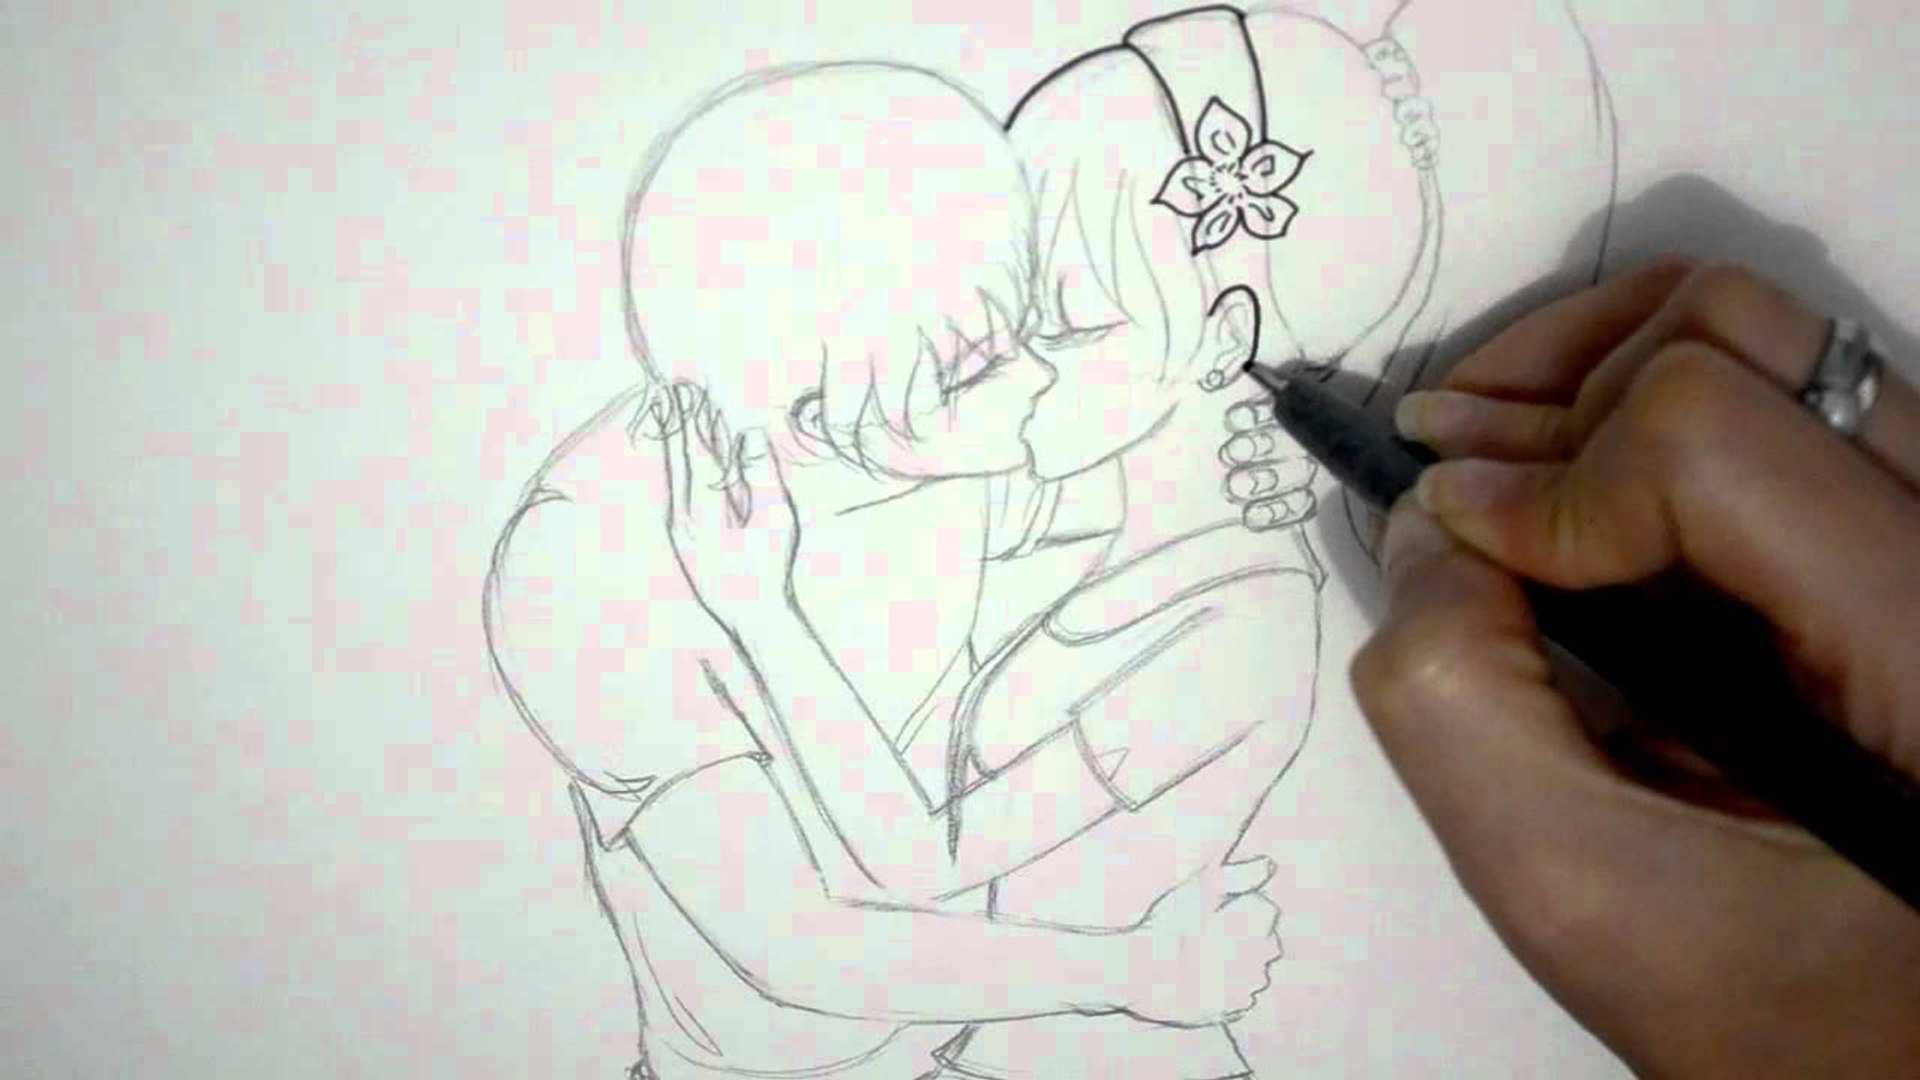 Como Dibujar Una Pareja Anime Besandose Dibujo De Amor